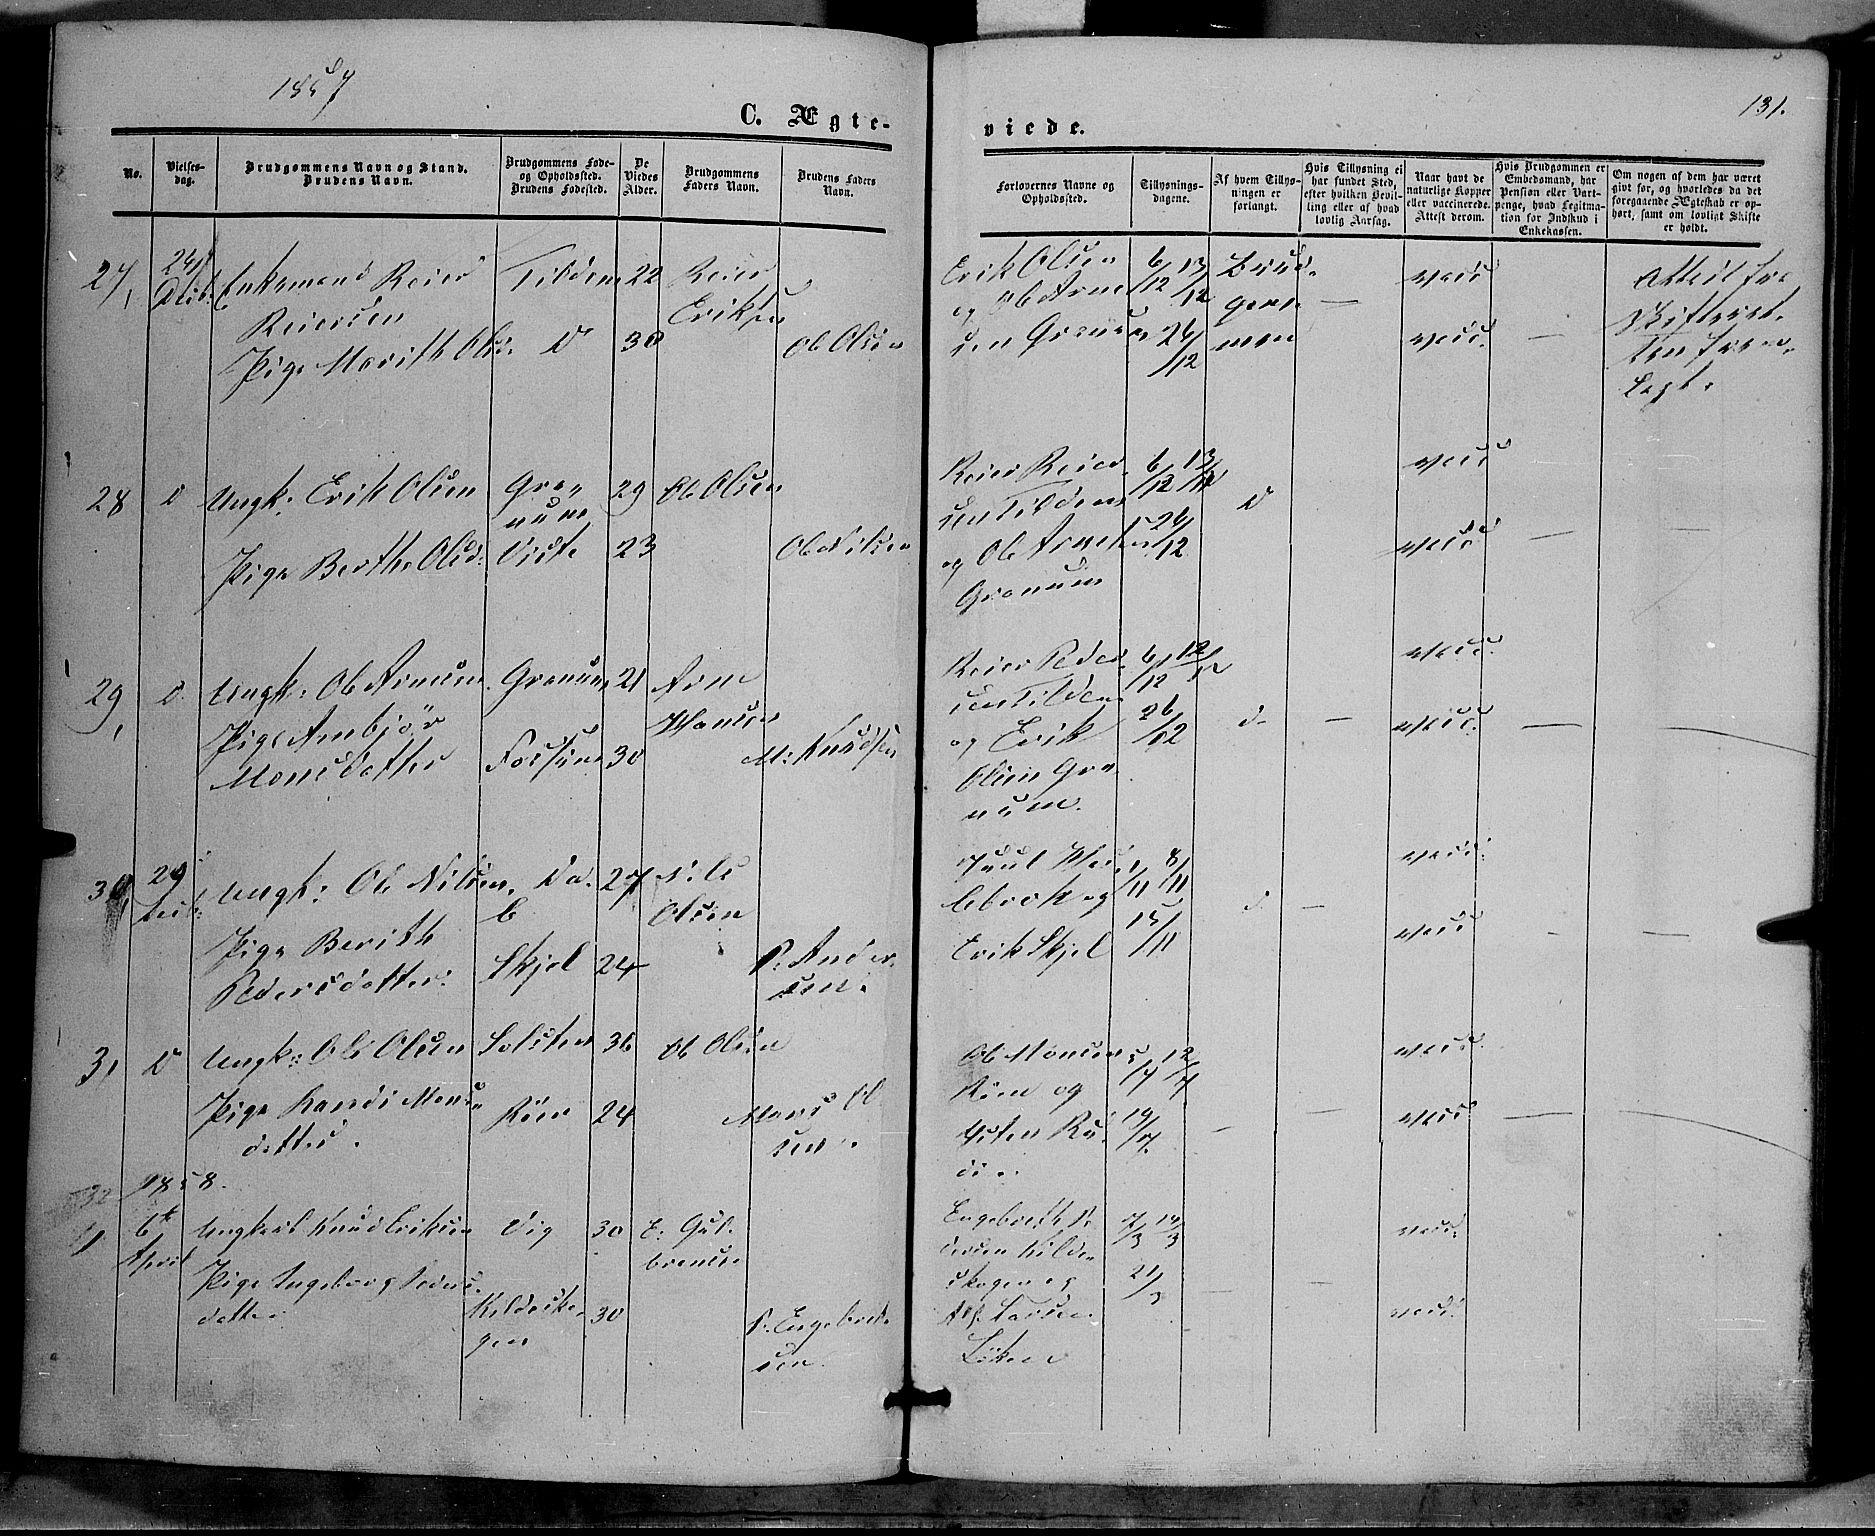 SAH, Vestre Slidre prestekontor, Ministerialbok nr. 2, 1856-1864, s. 131